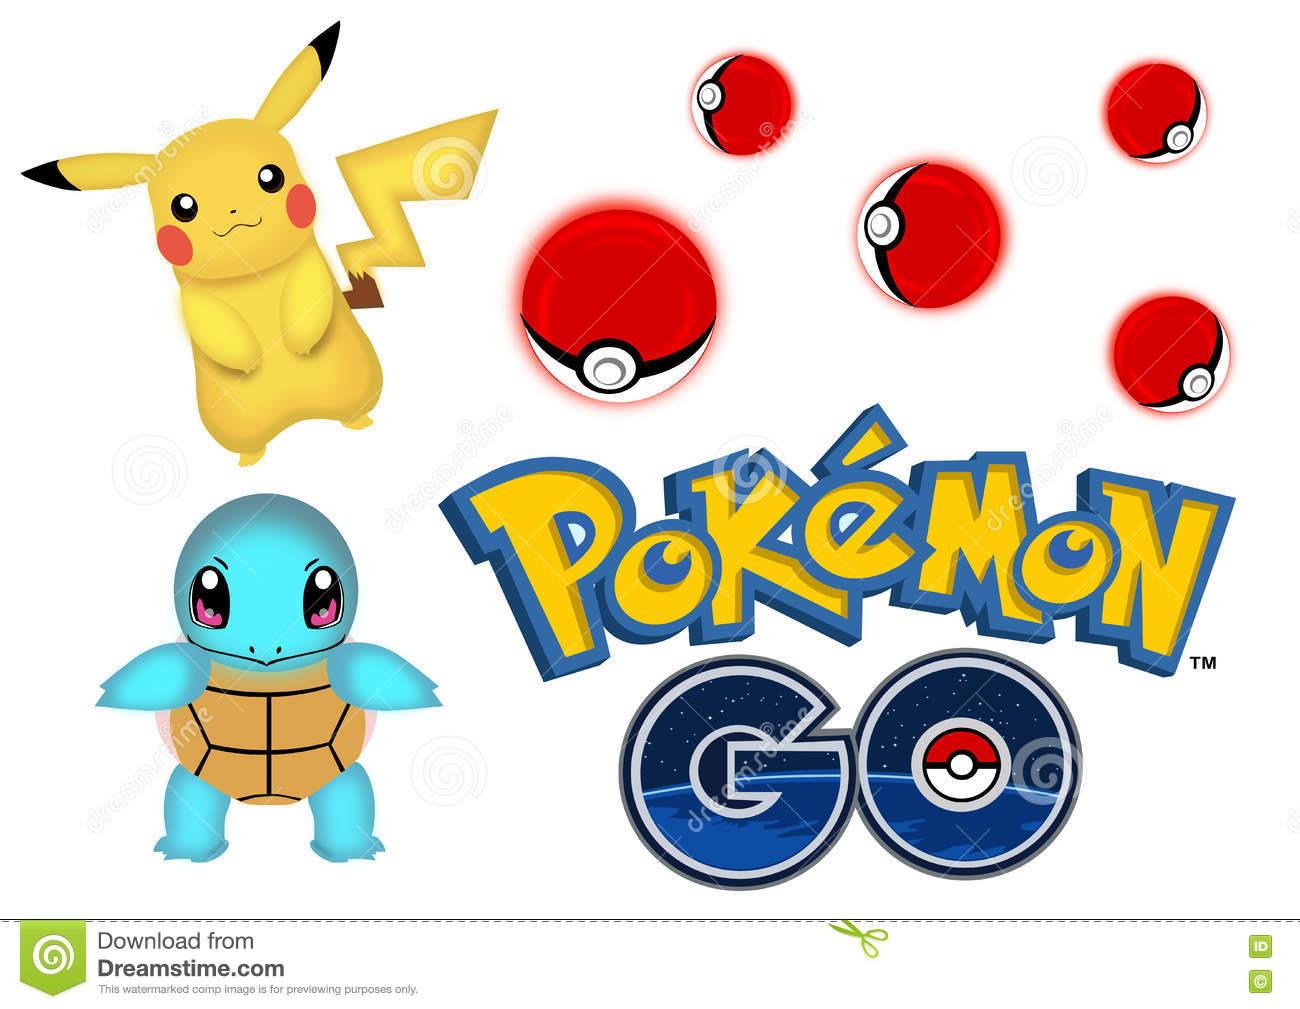 Pokemon Go Editorial Stock Photo.